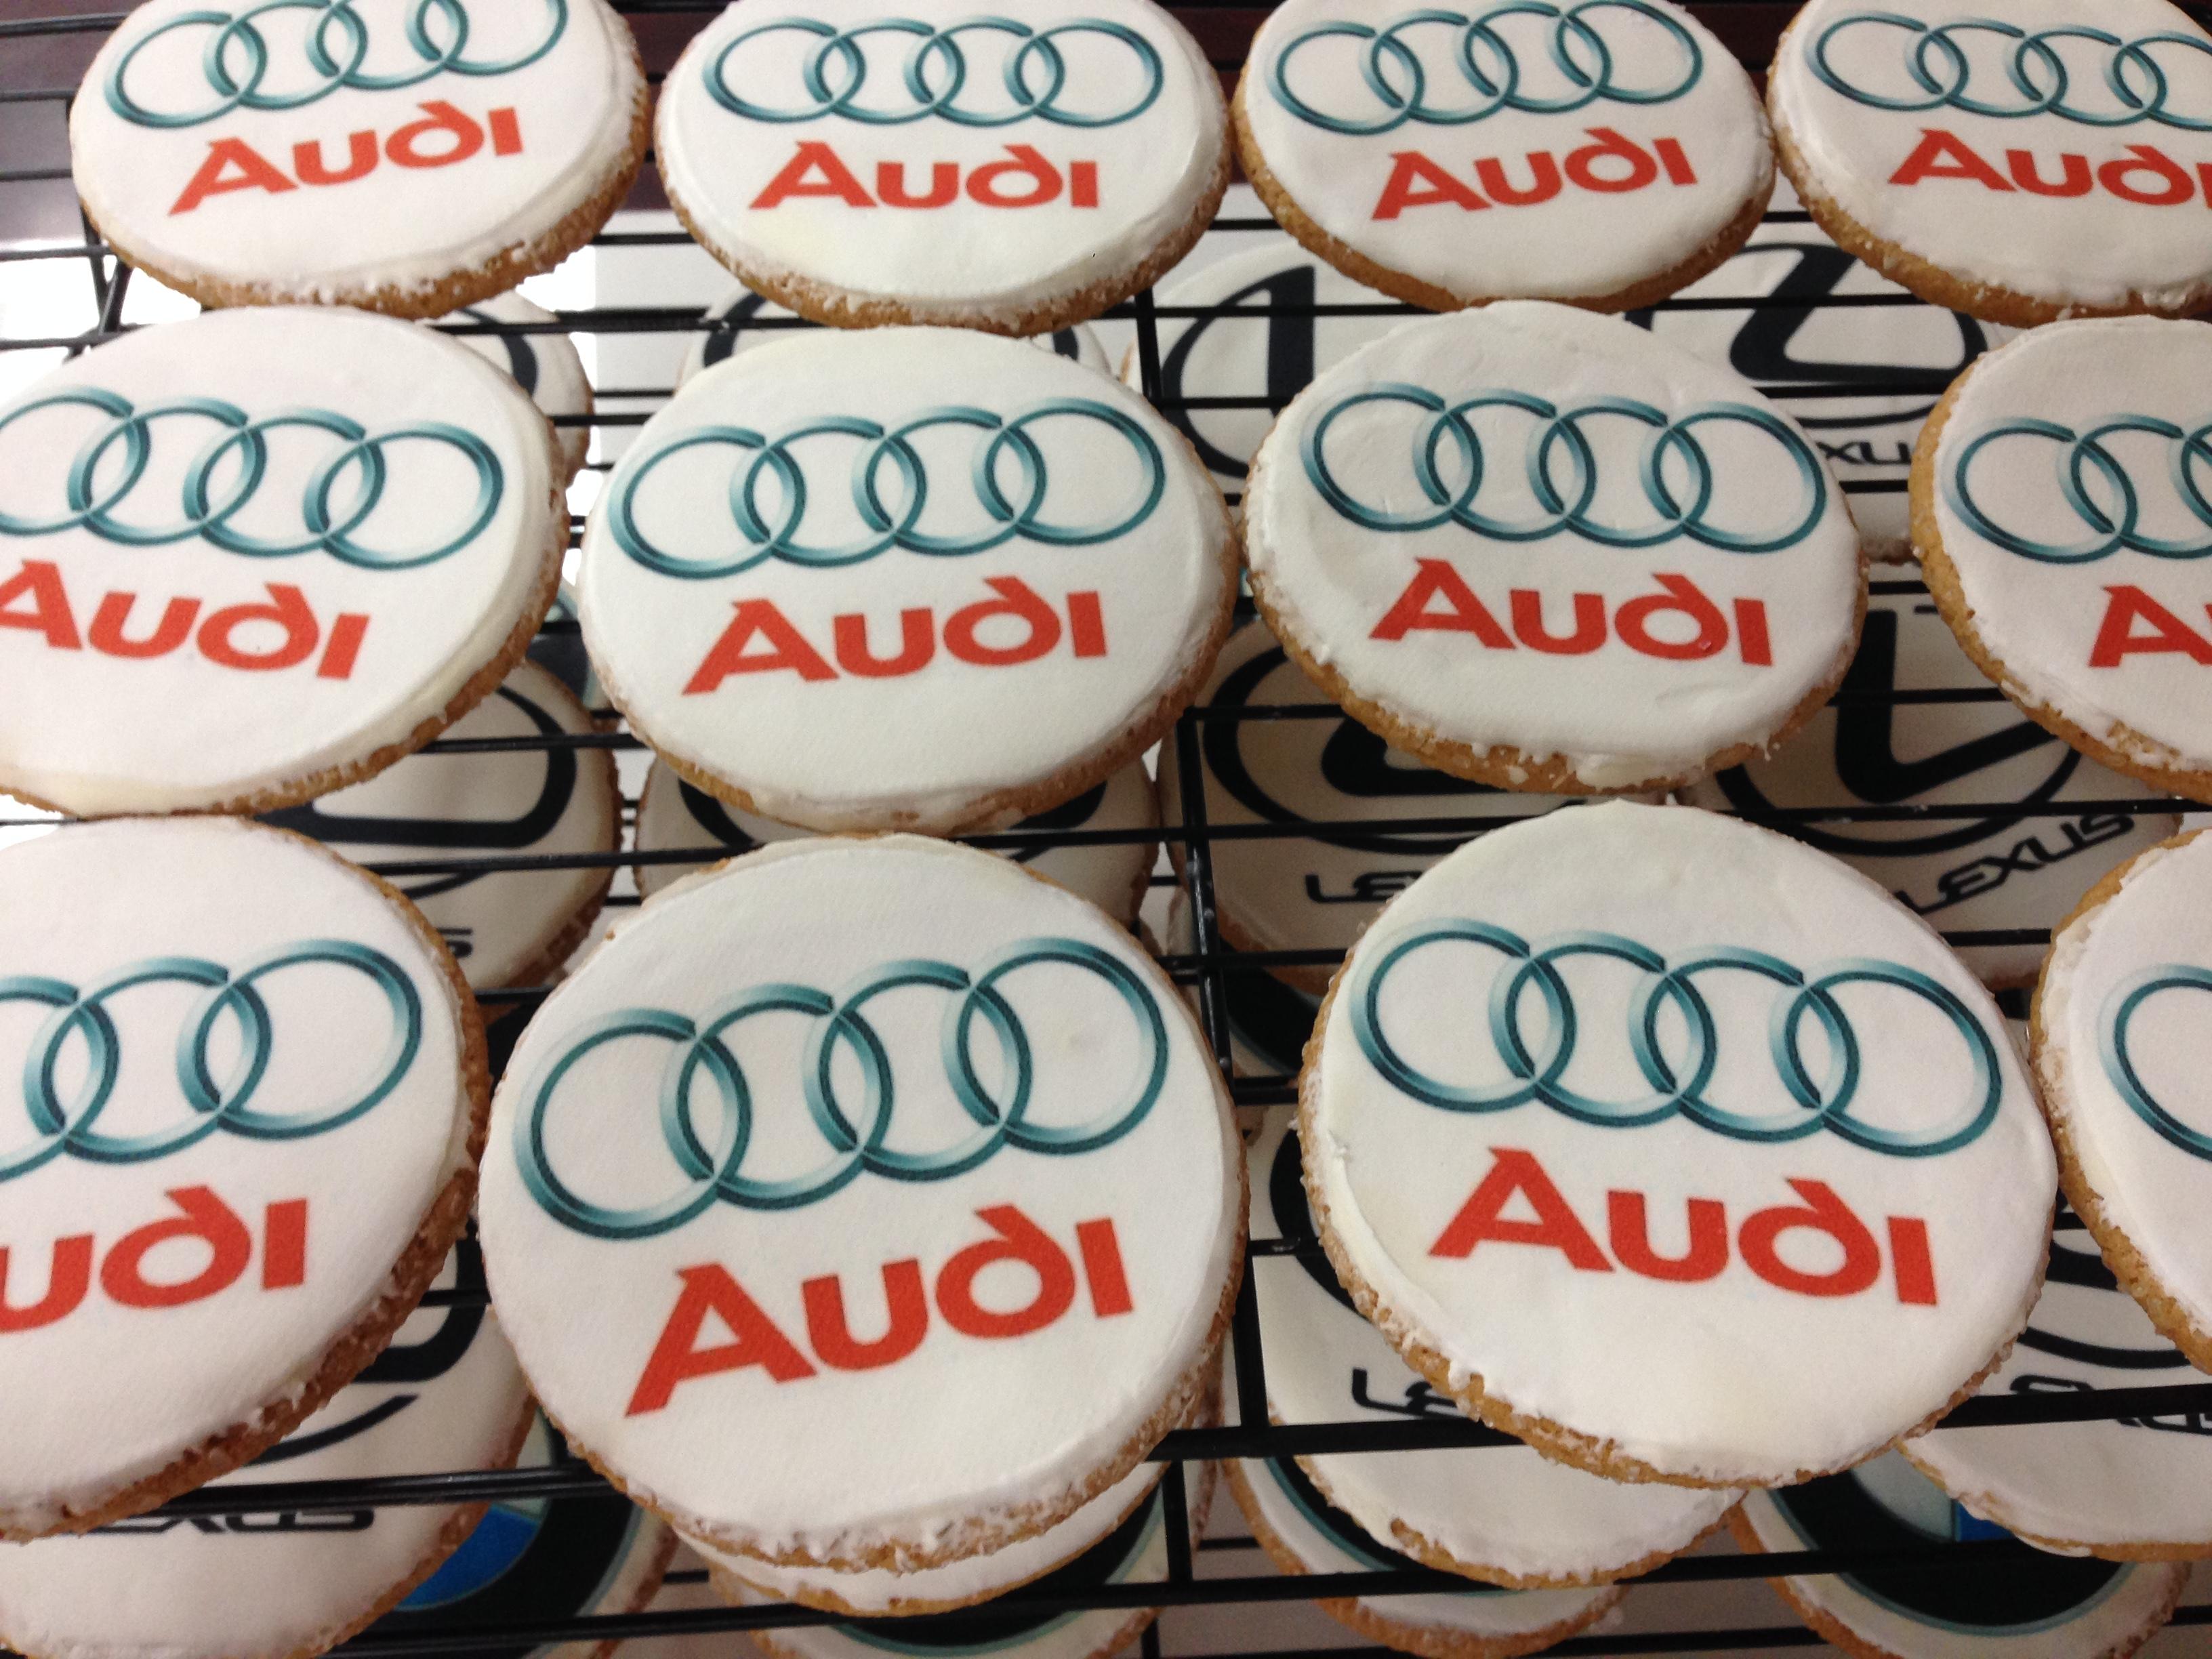 Audi Cookies!